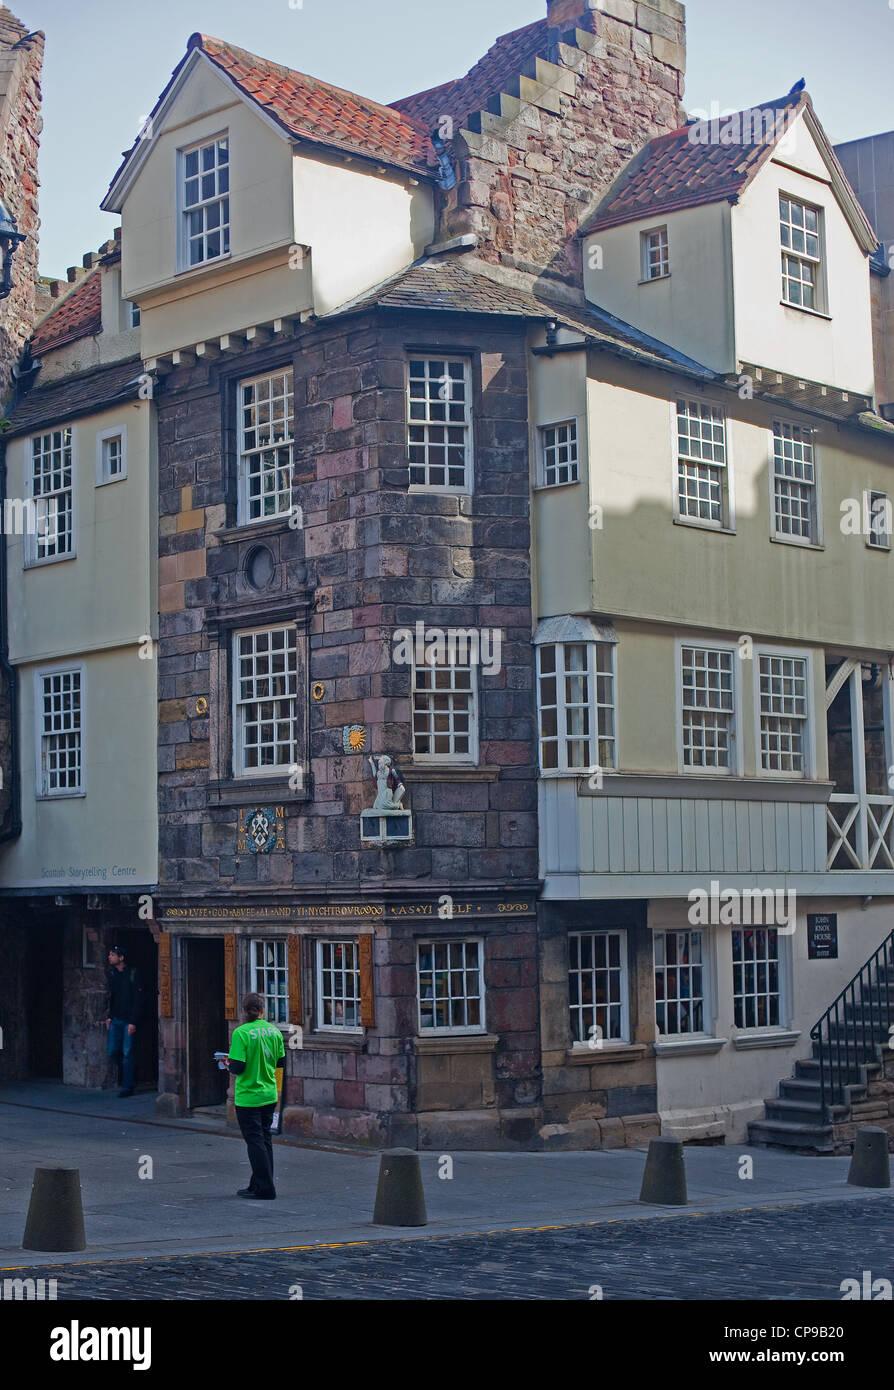 The John Knox House, Royal Mile, Old Town, Edinburgh Stock Photo